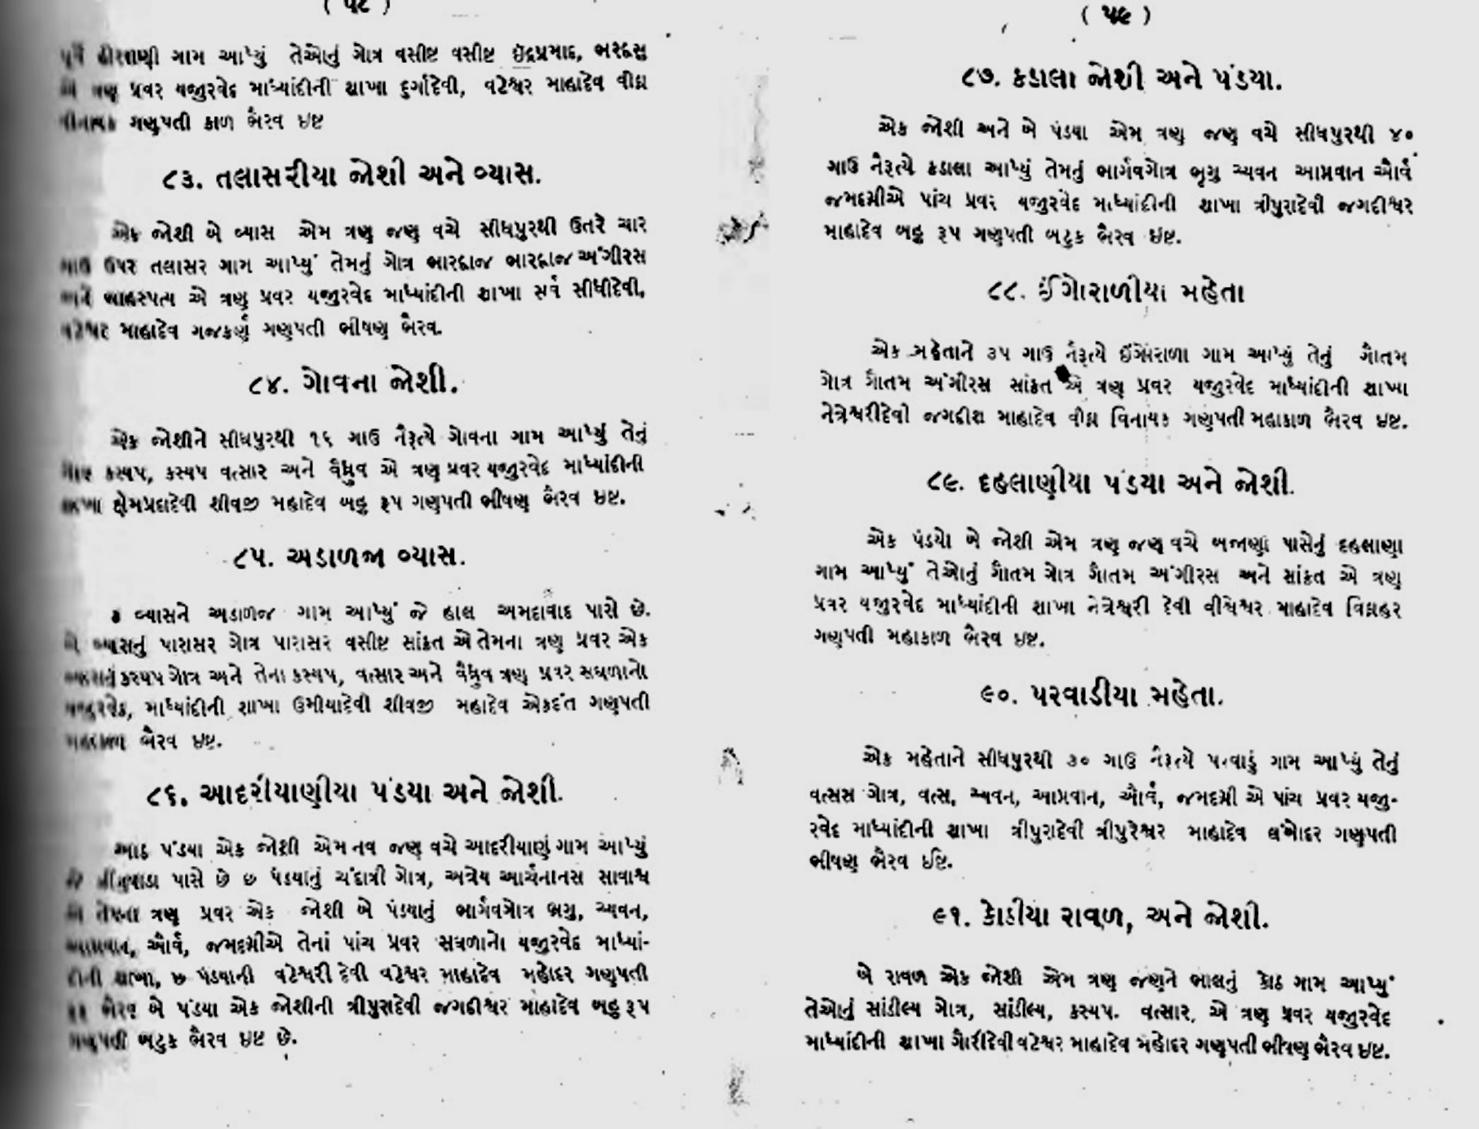 File:58 59    7,Audichya Sashtra Brahmin's Gotra,Parva,Ved